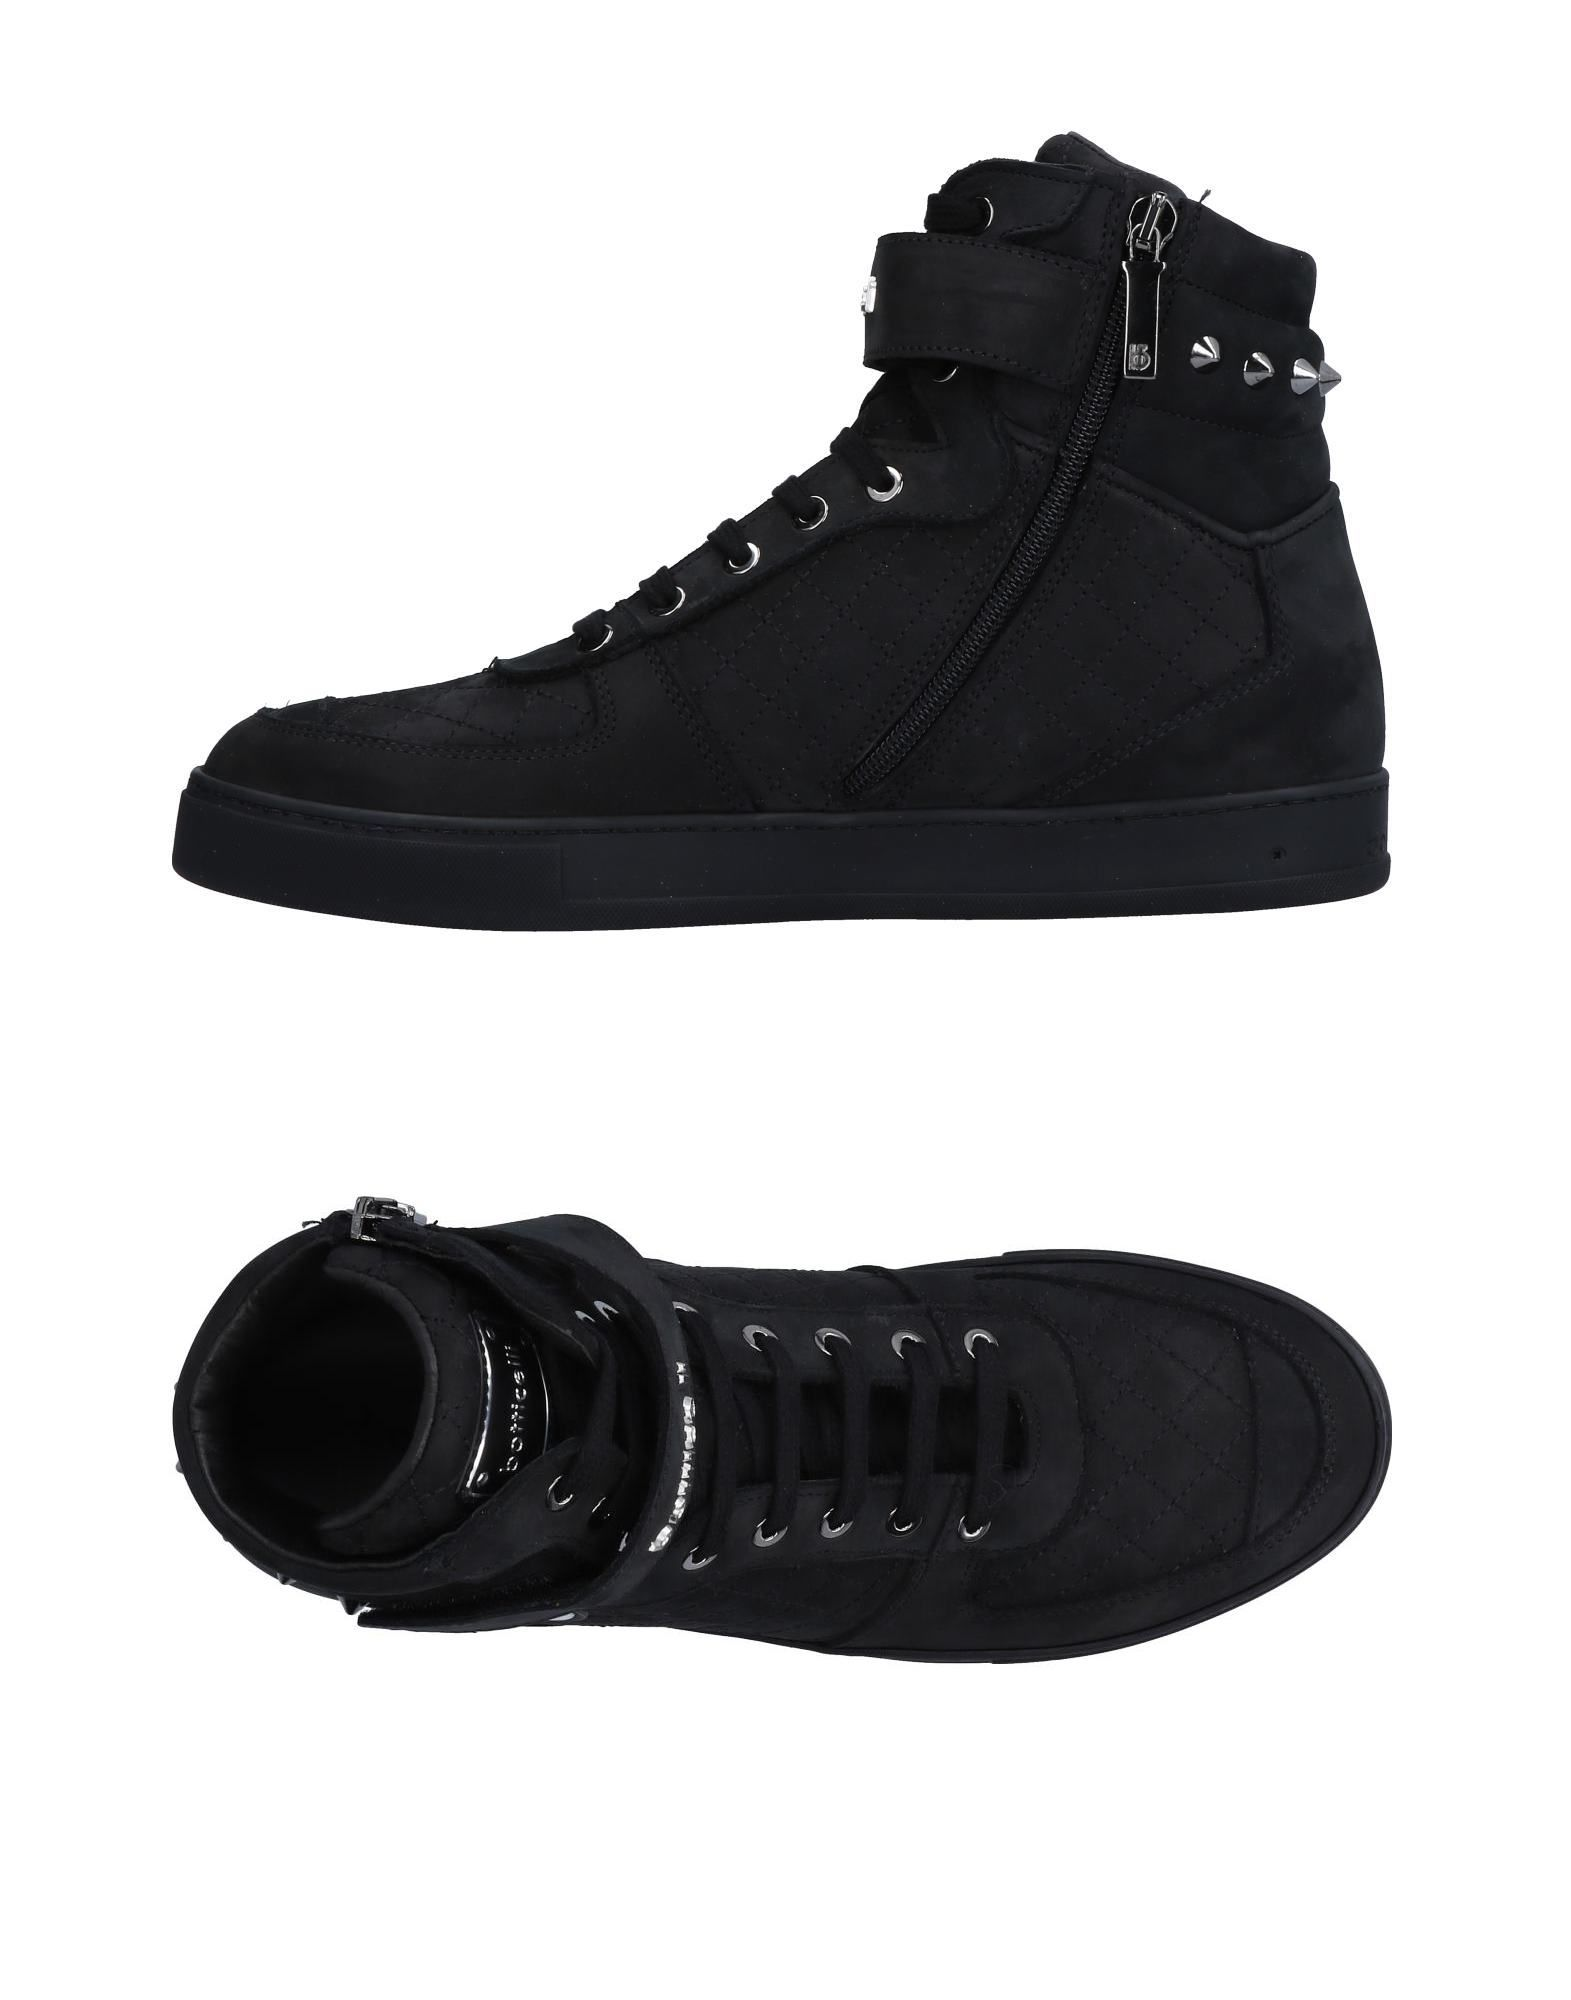 Roberto Botticelli Sneakers Herren  11515685KR Gute Gute Gute Qualität beliebte Schuhe 4839a1